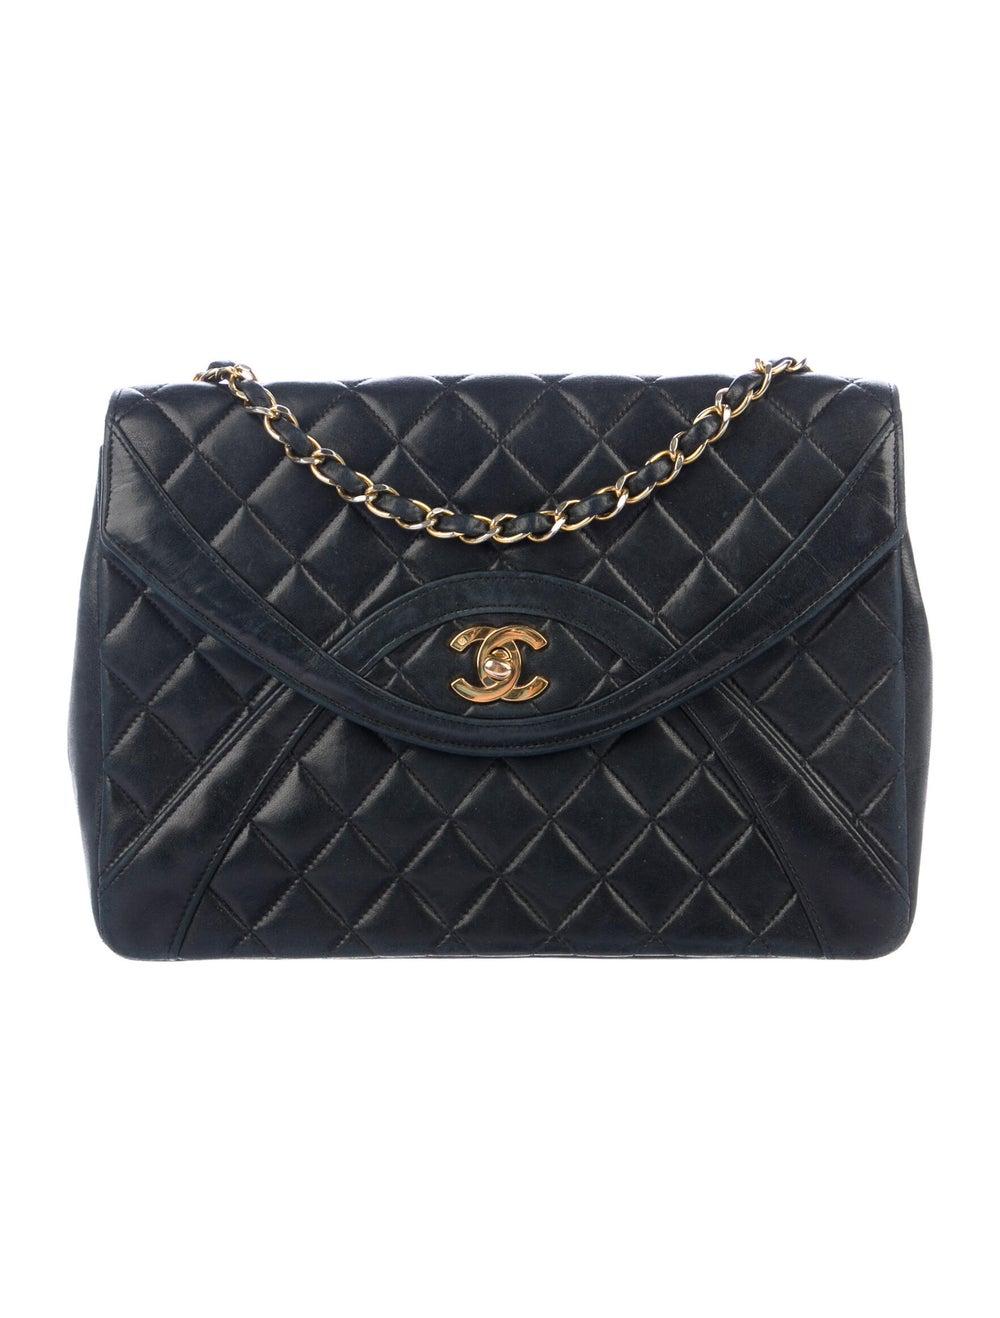 Chanel Vintage Half Moon Flap Bag Blue - image 1